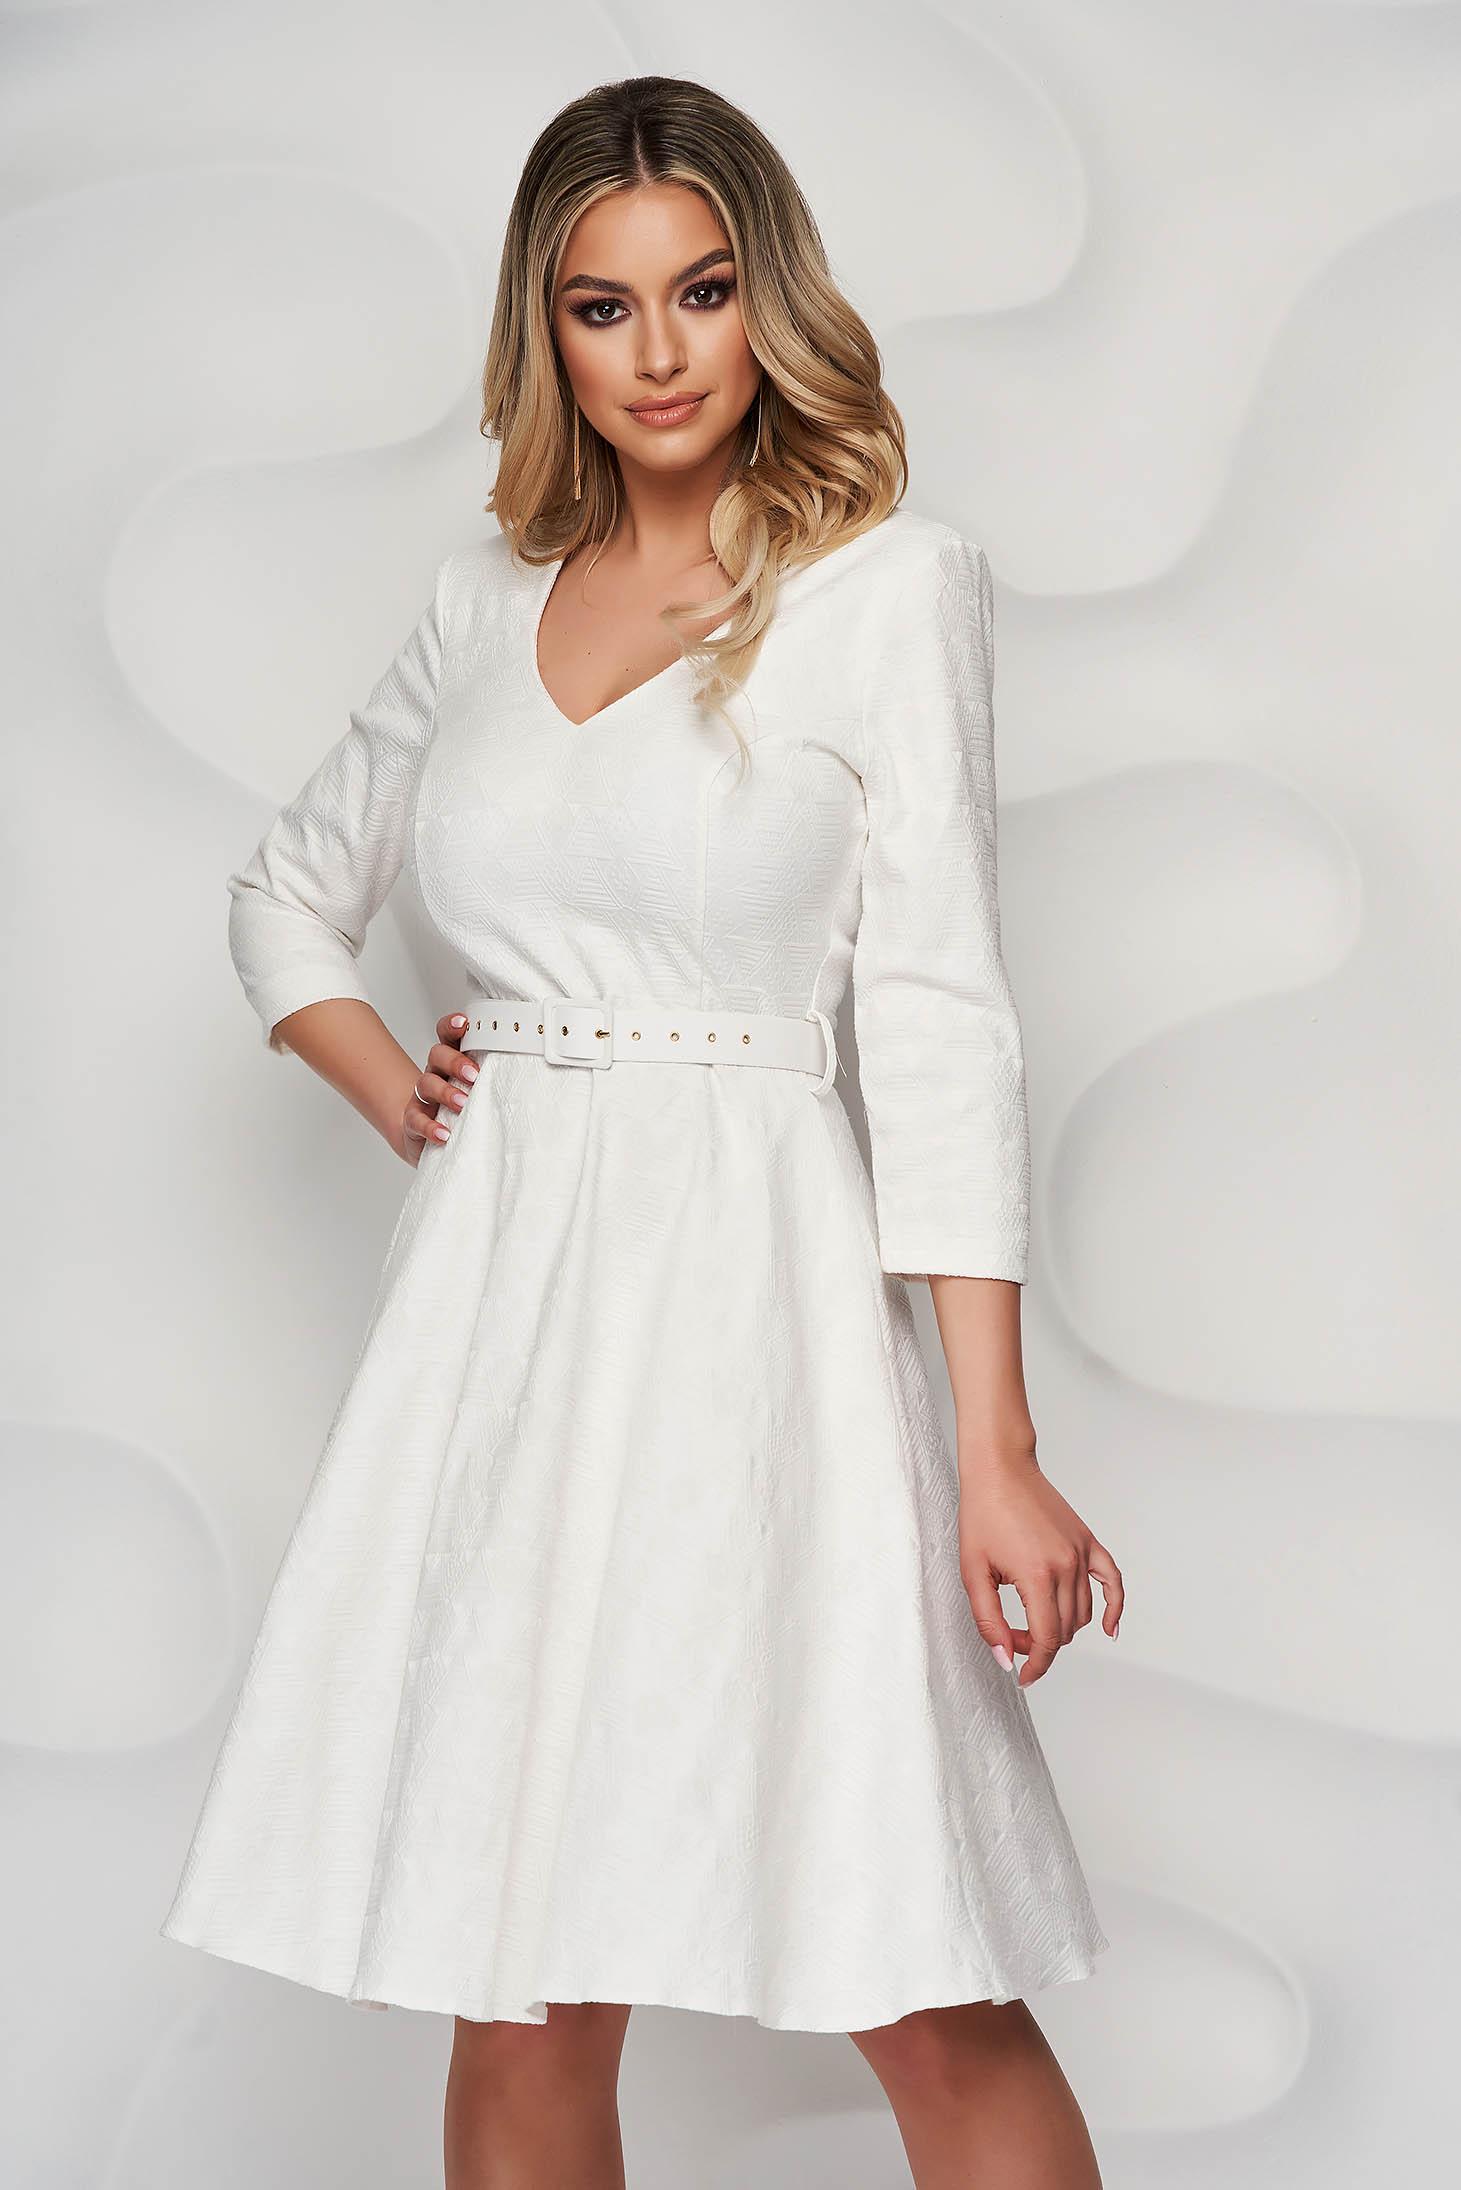 StarShinerS ivory dress cloche elegant with v-neckline nonelastic fabric